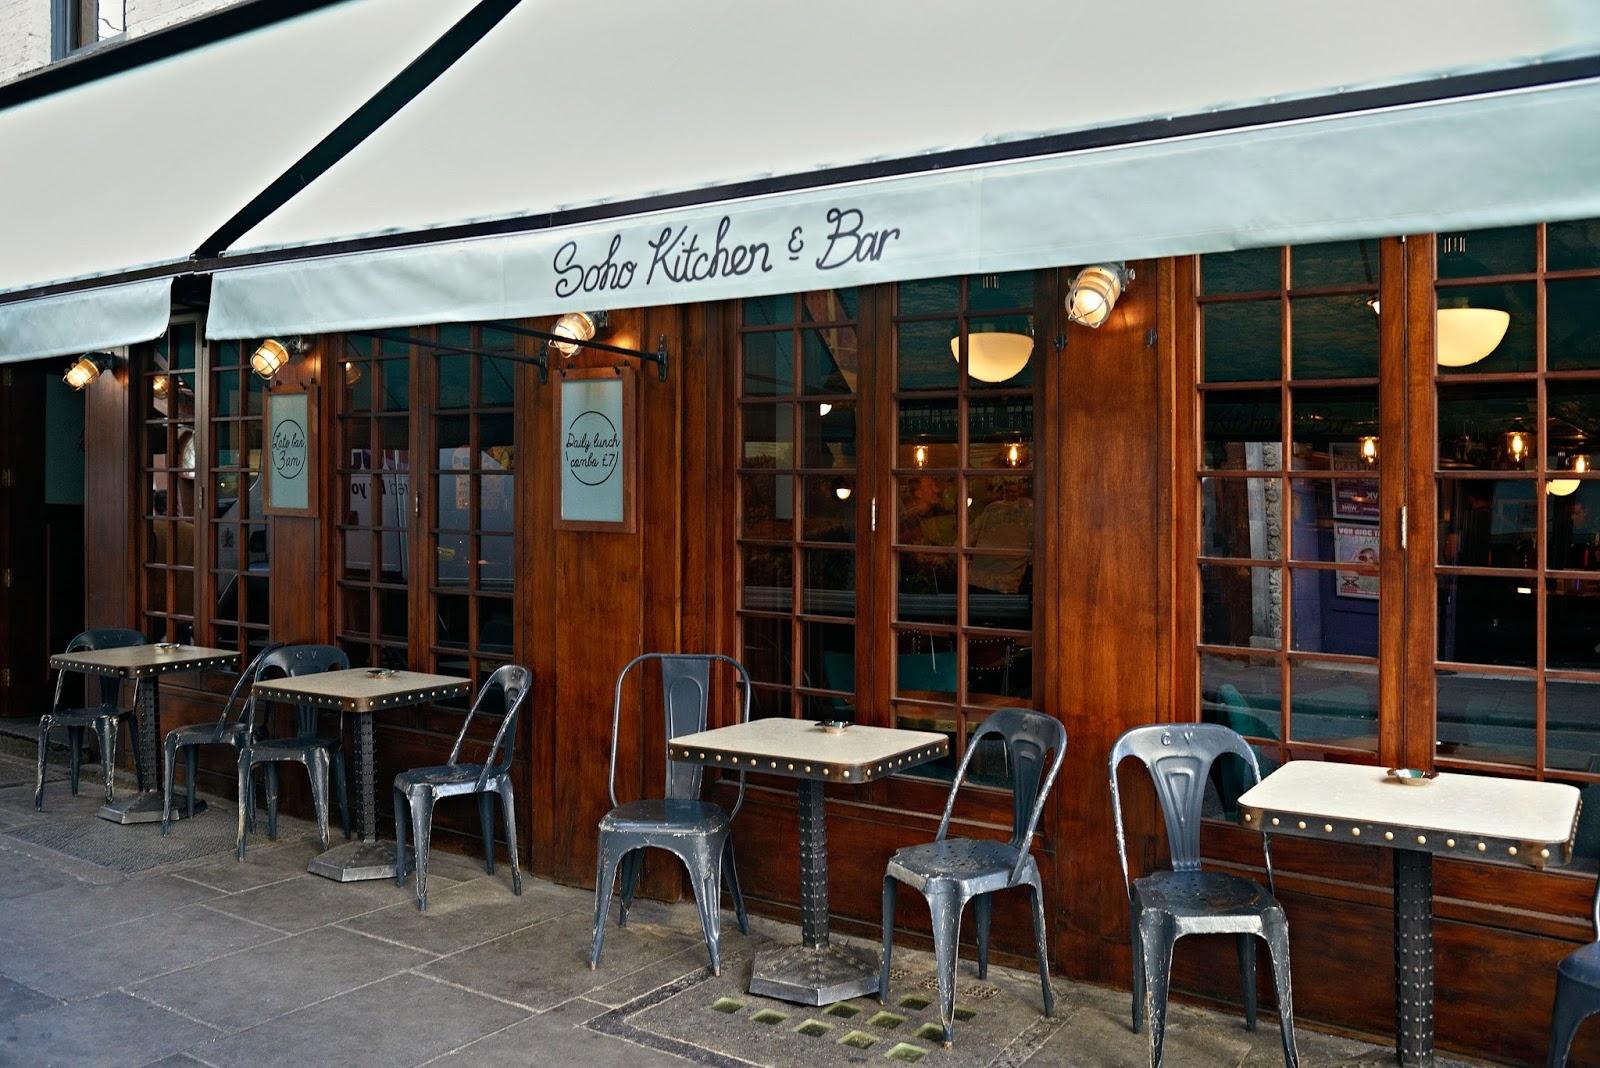 SOHO KITCHEN & BAR Soho London – Hungry Hong Kong